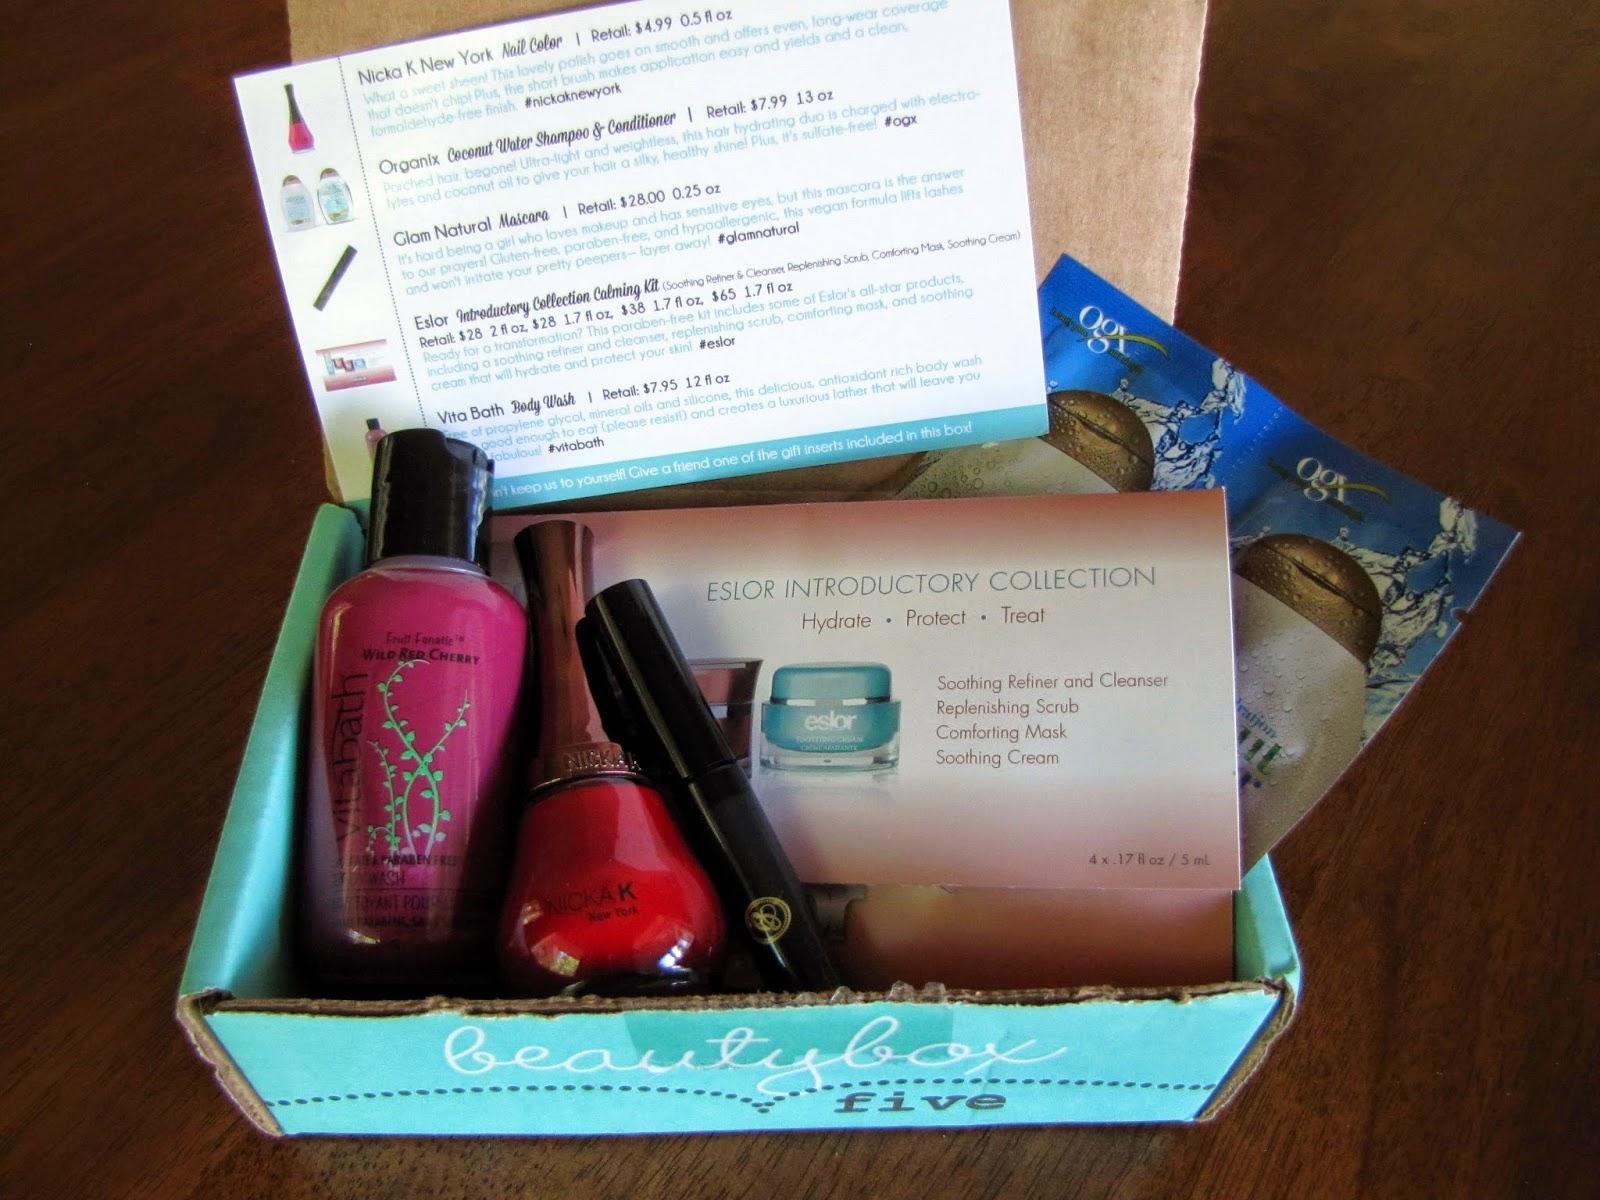 Makeup Miscellaneous: Beauty Box 5 - June 2014